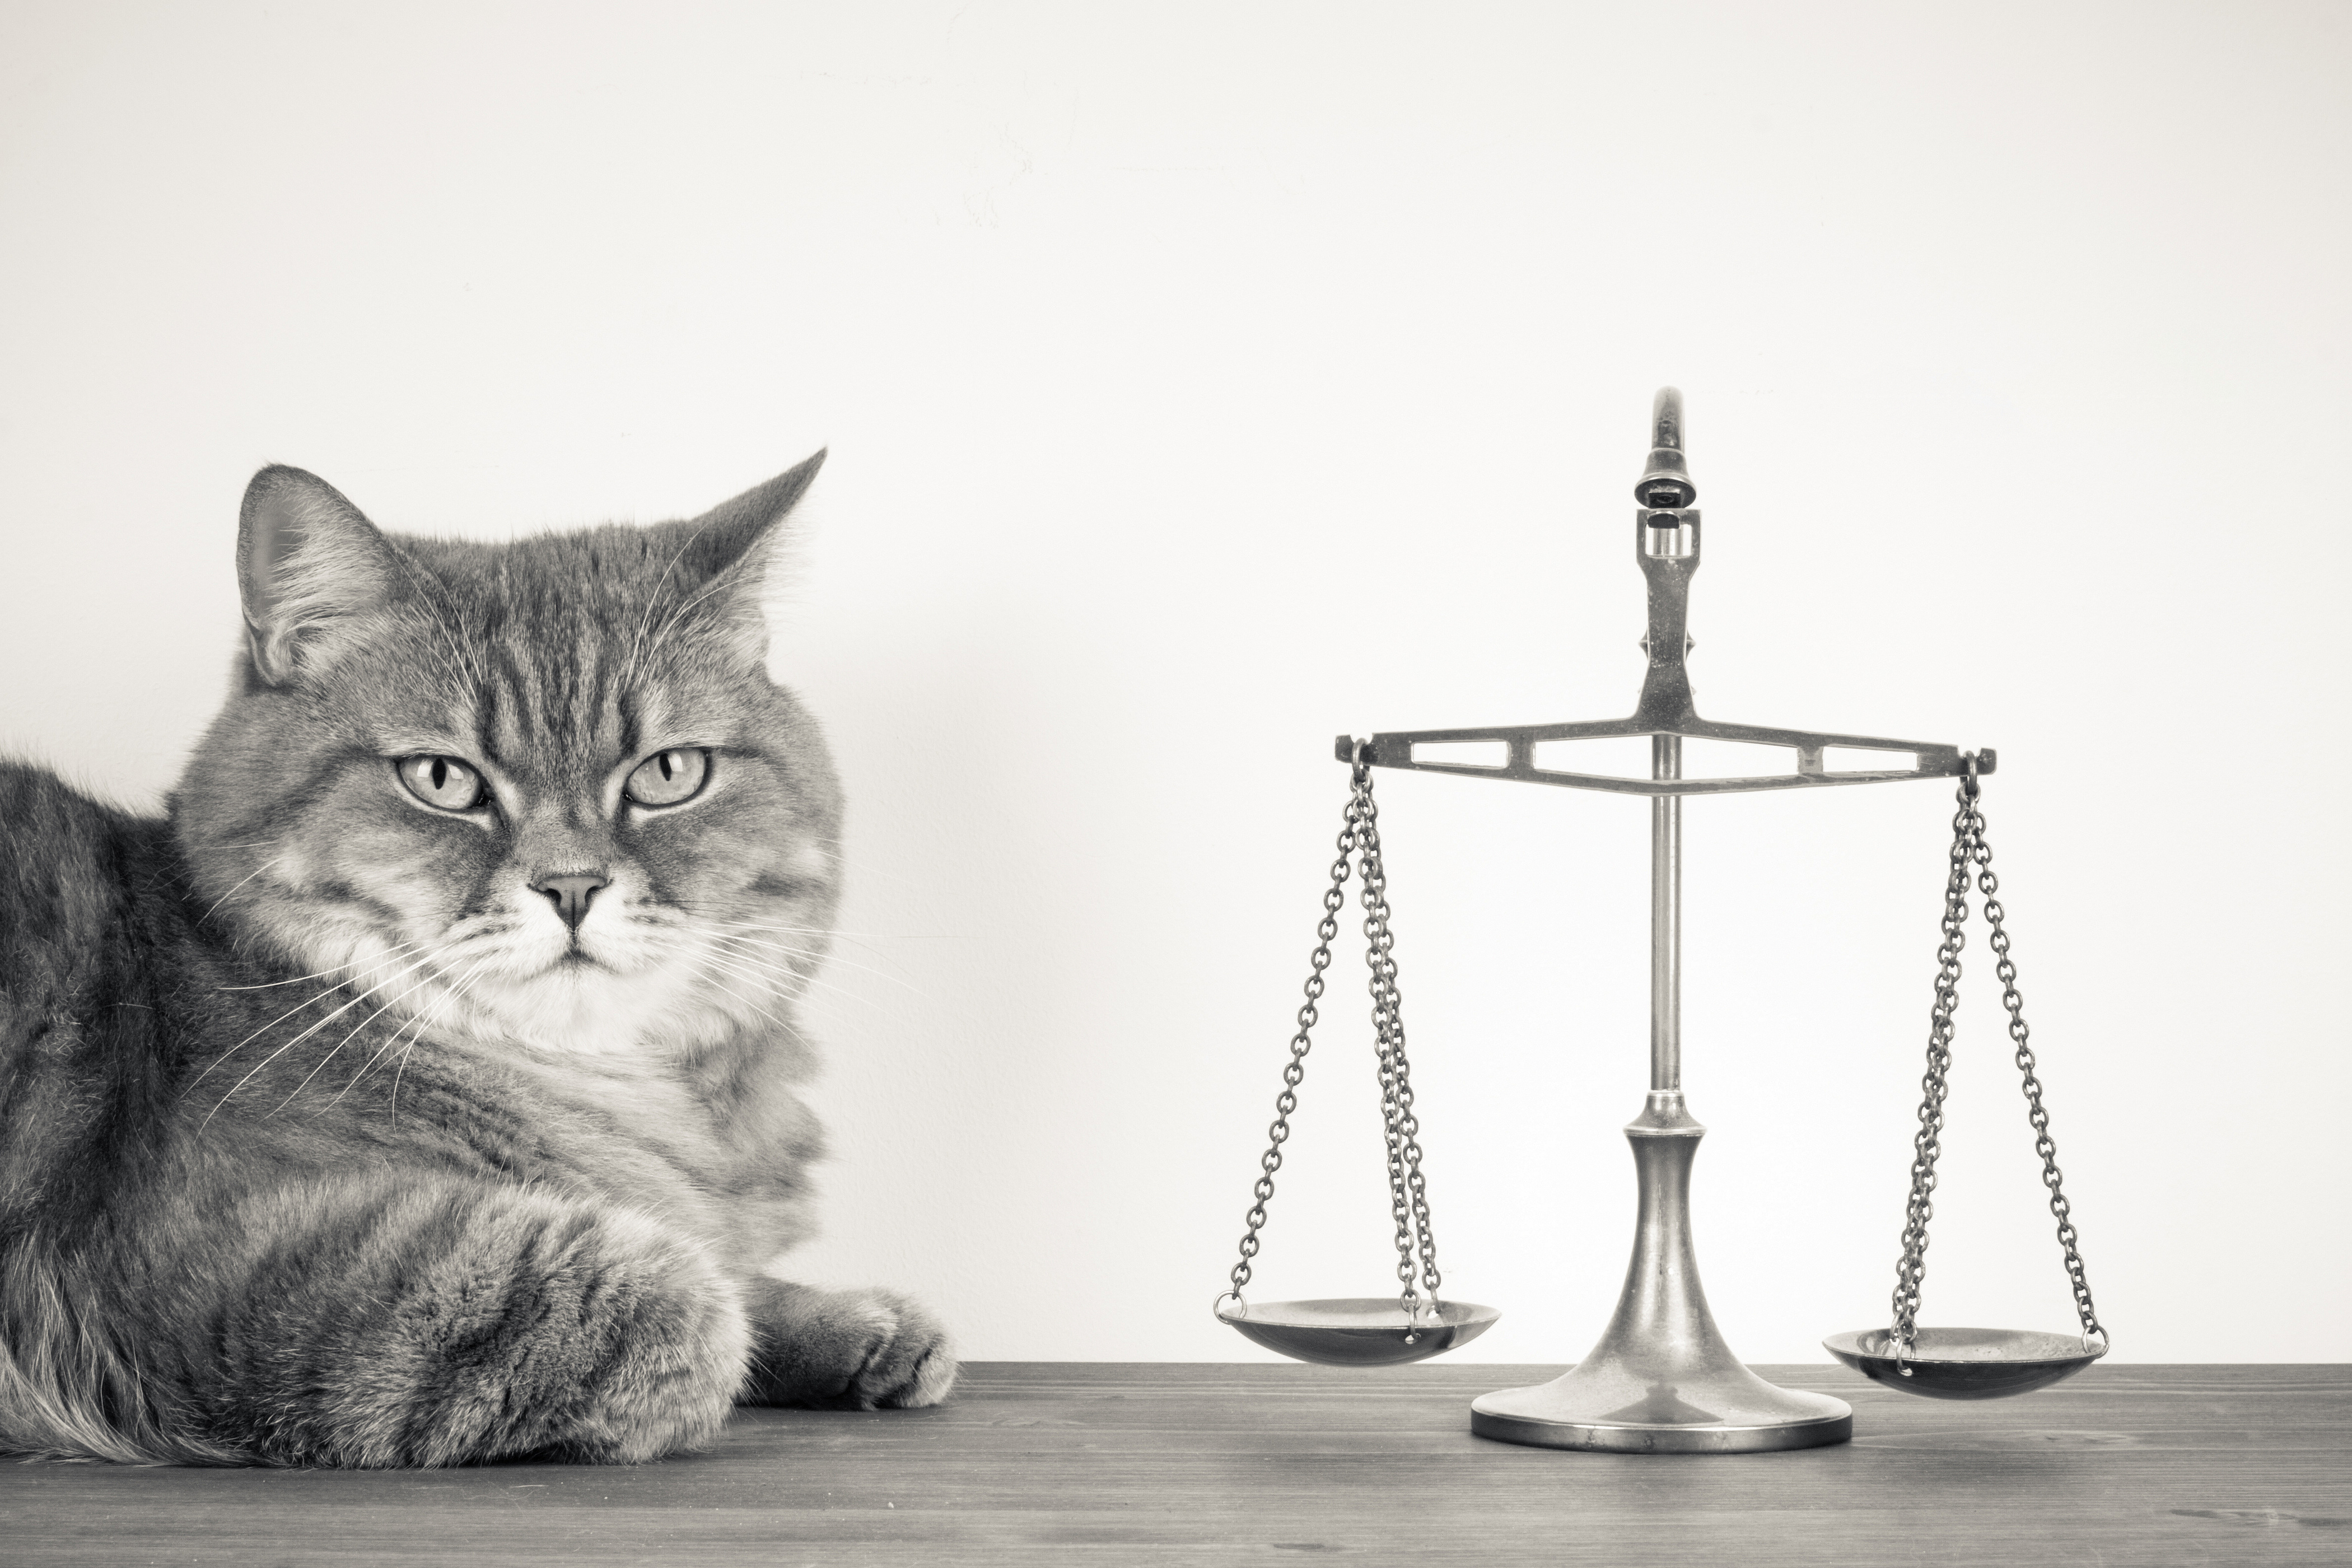 Feline Legal Issues In The DMV